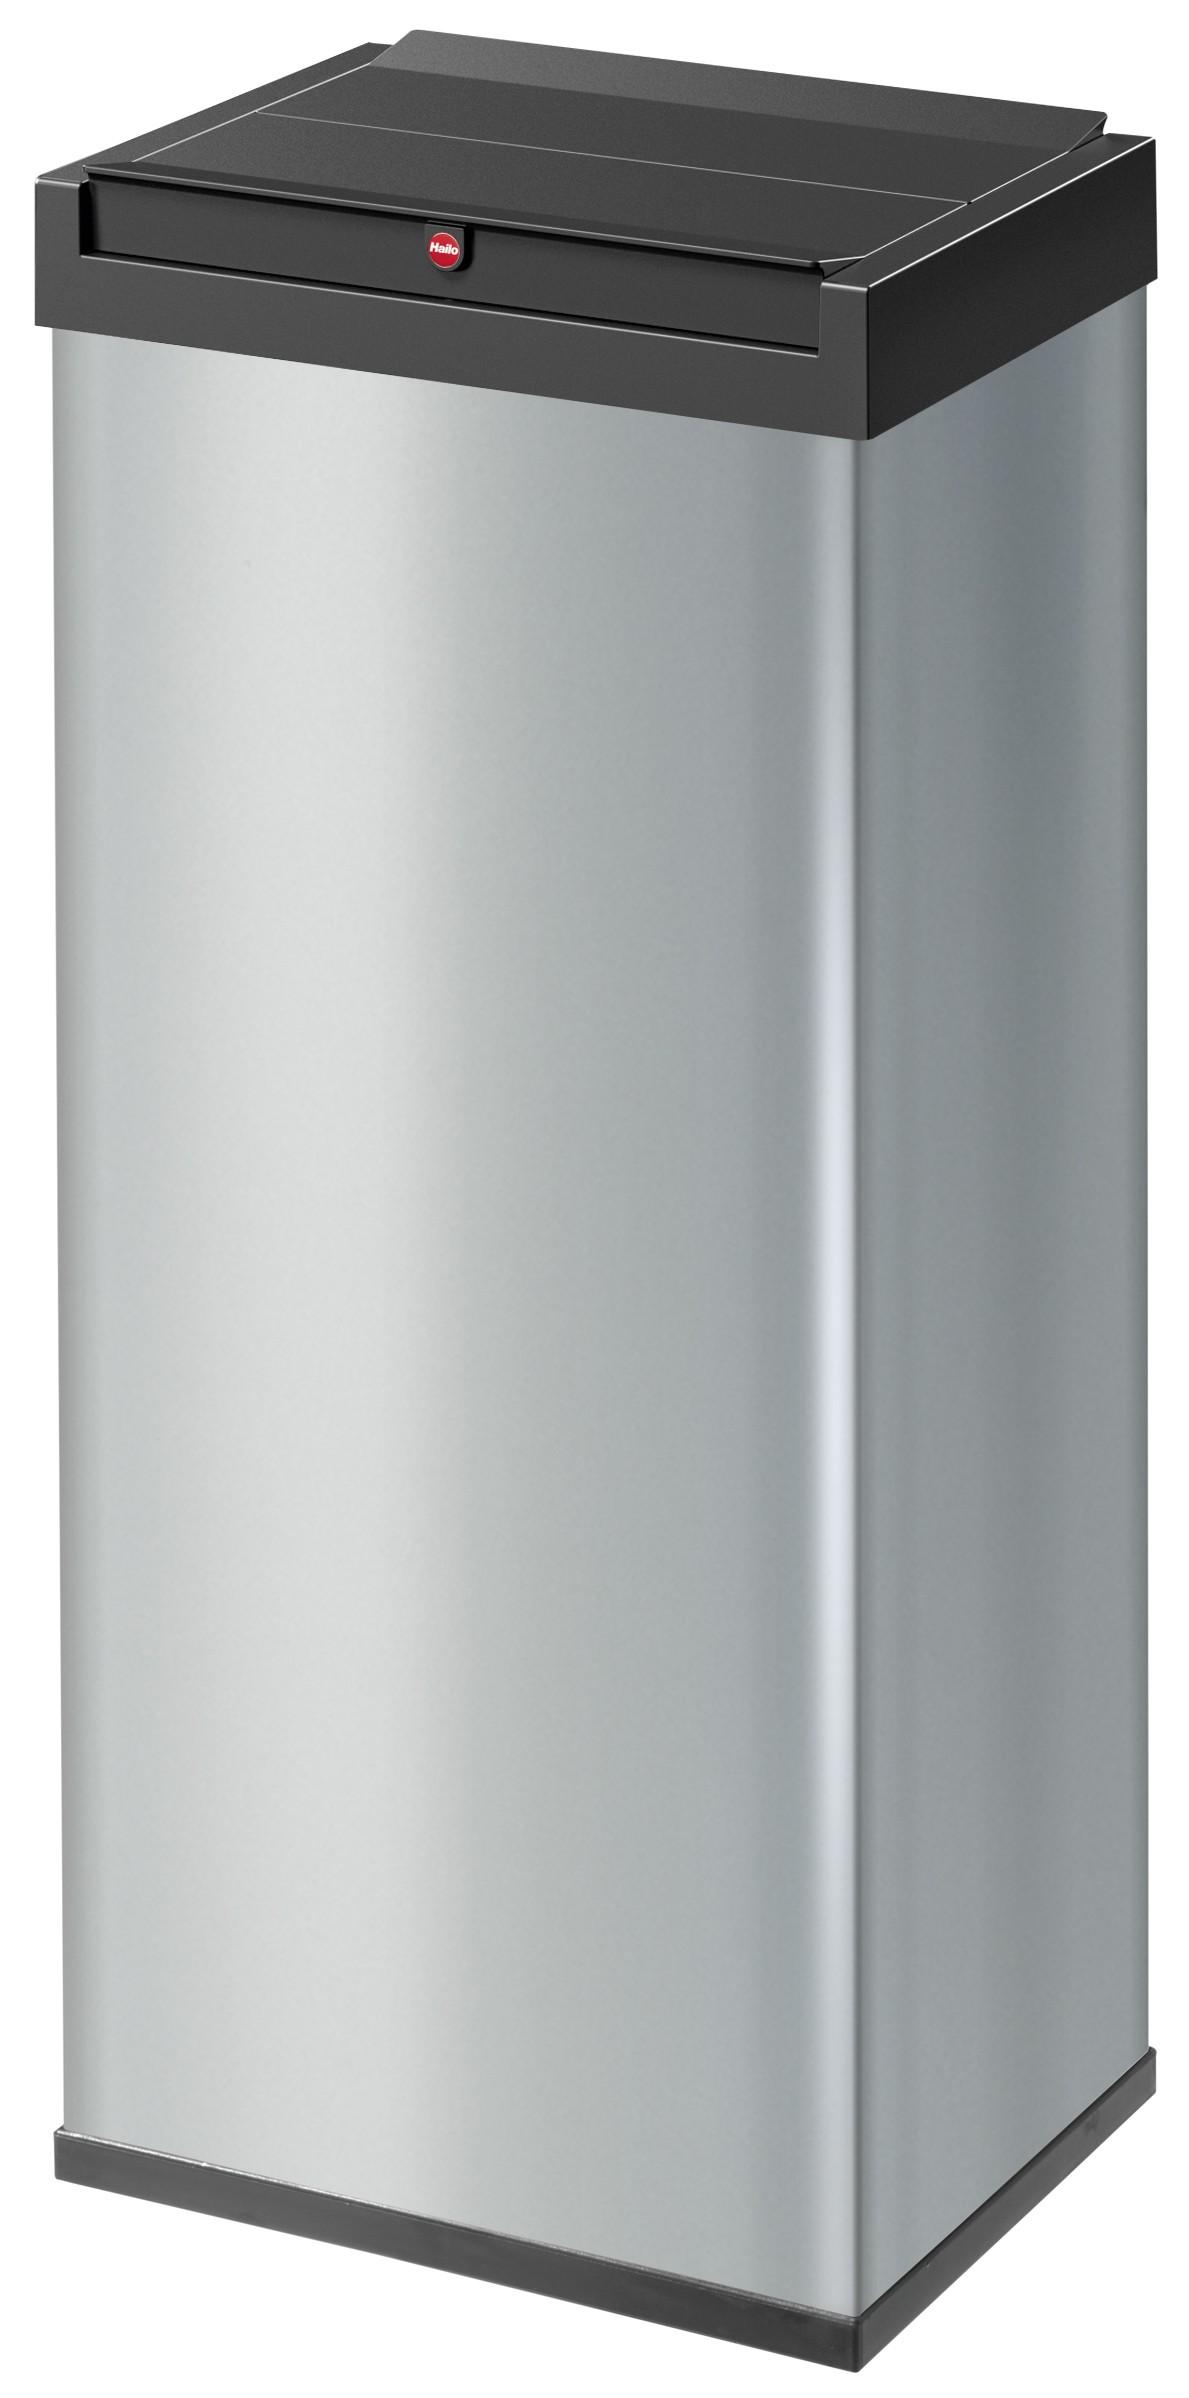 Hailo Big-Box Swing XL, silber, 52 Liter, Großraum-Abfallbox